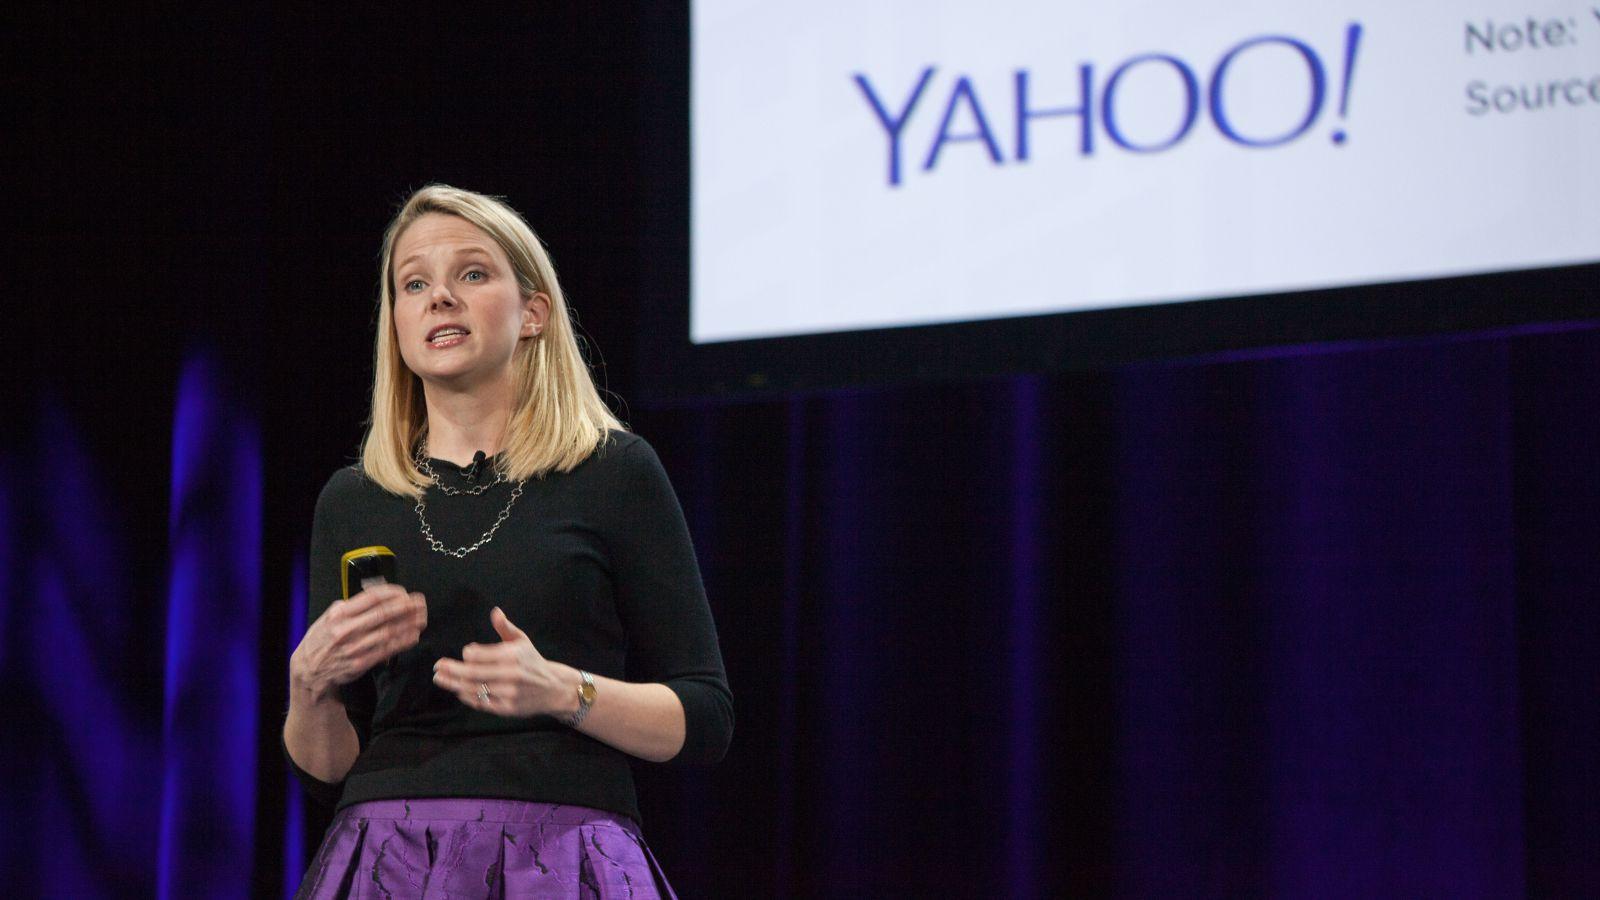 Verizon si compra Yahoo con 5 miliardi di dollari